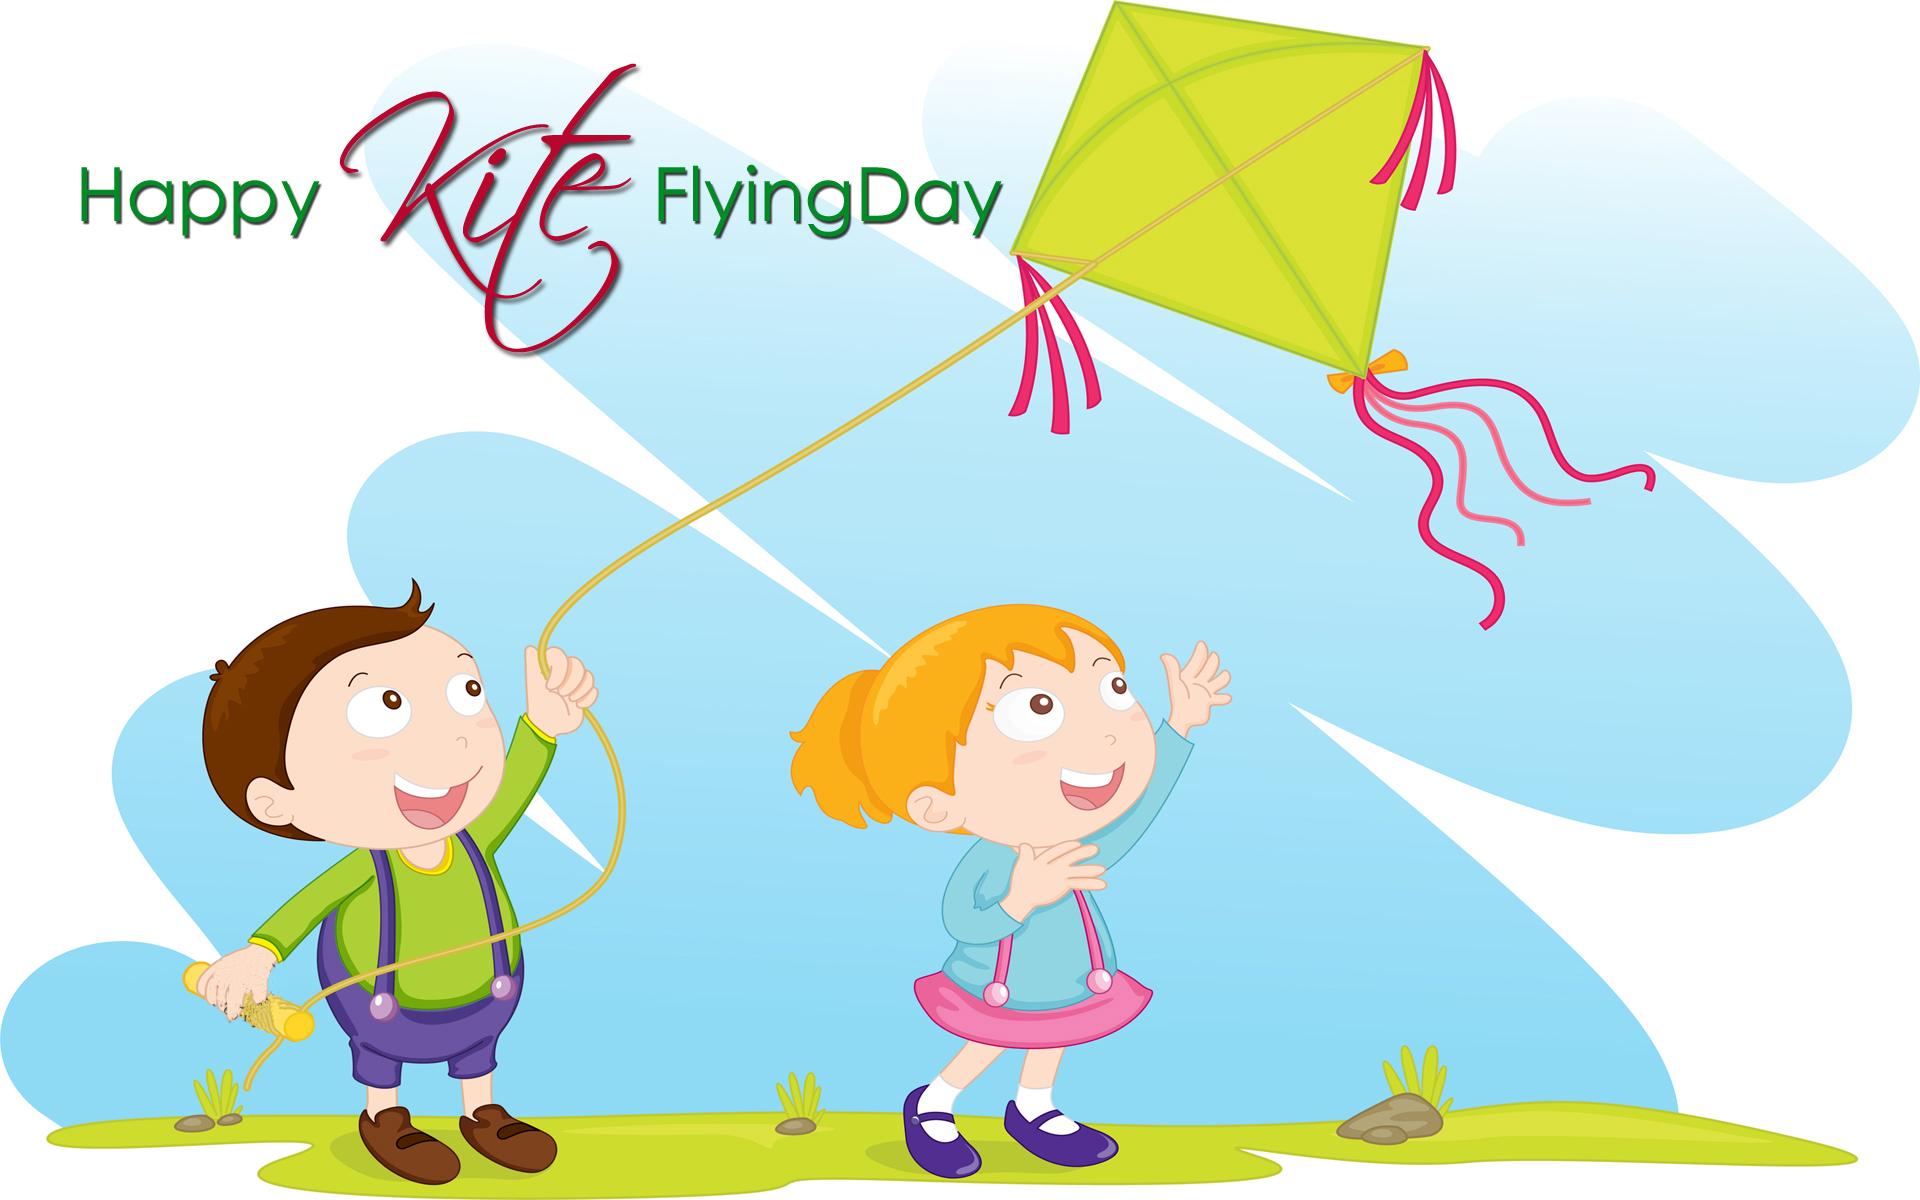 Festival clipart uttarayan Free Images New kite kite